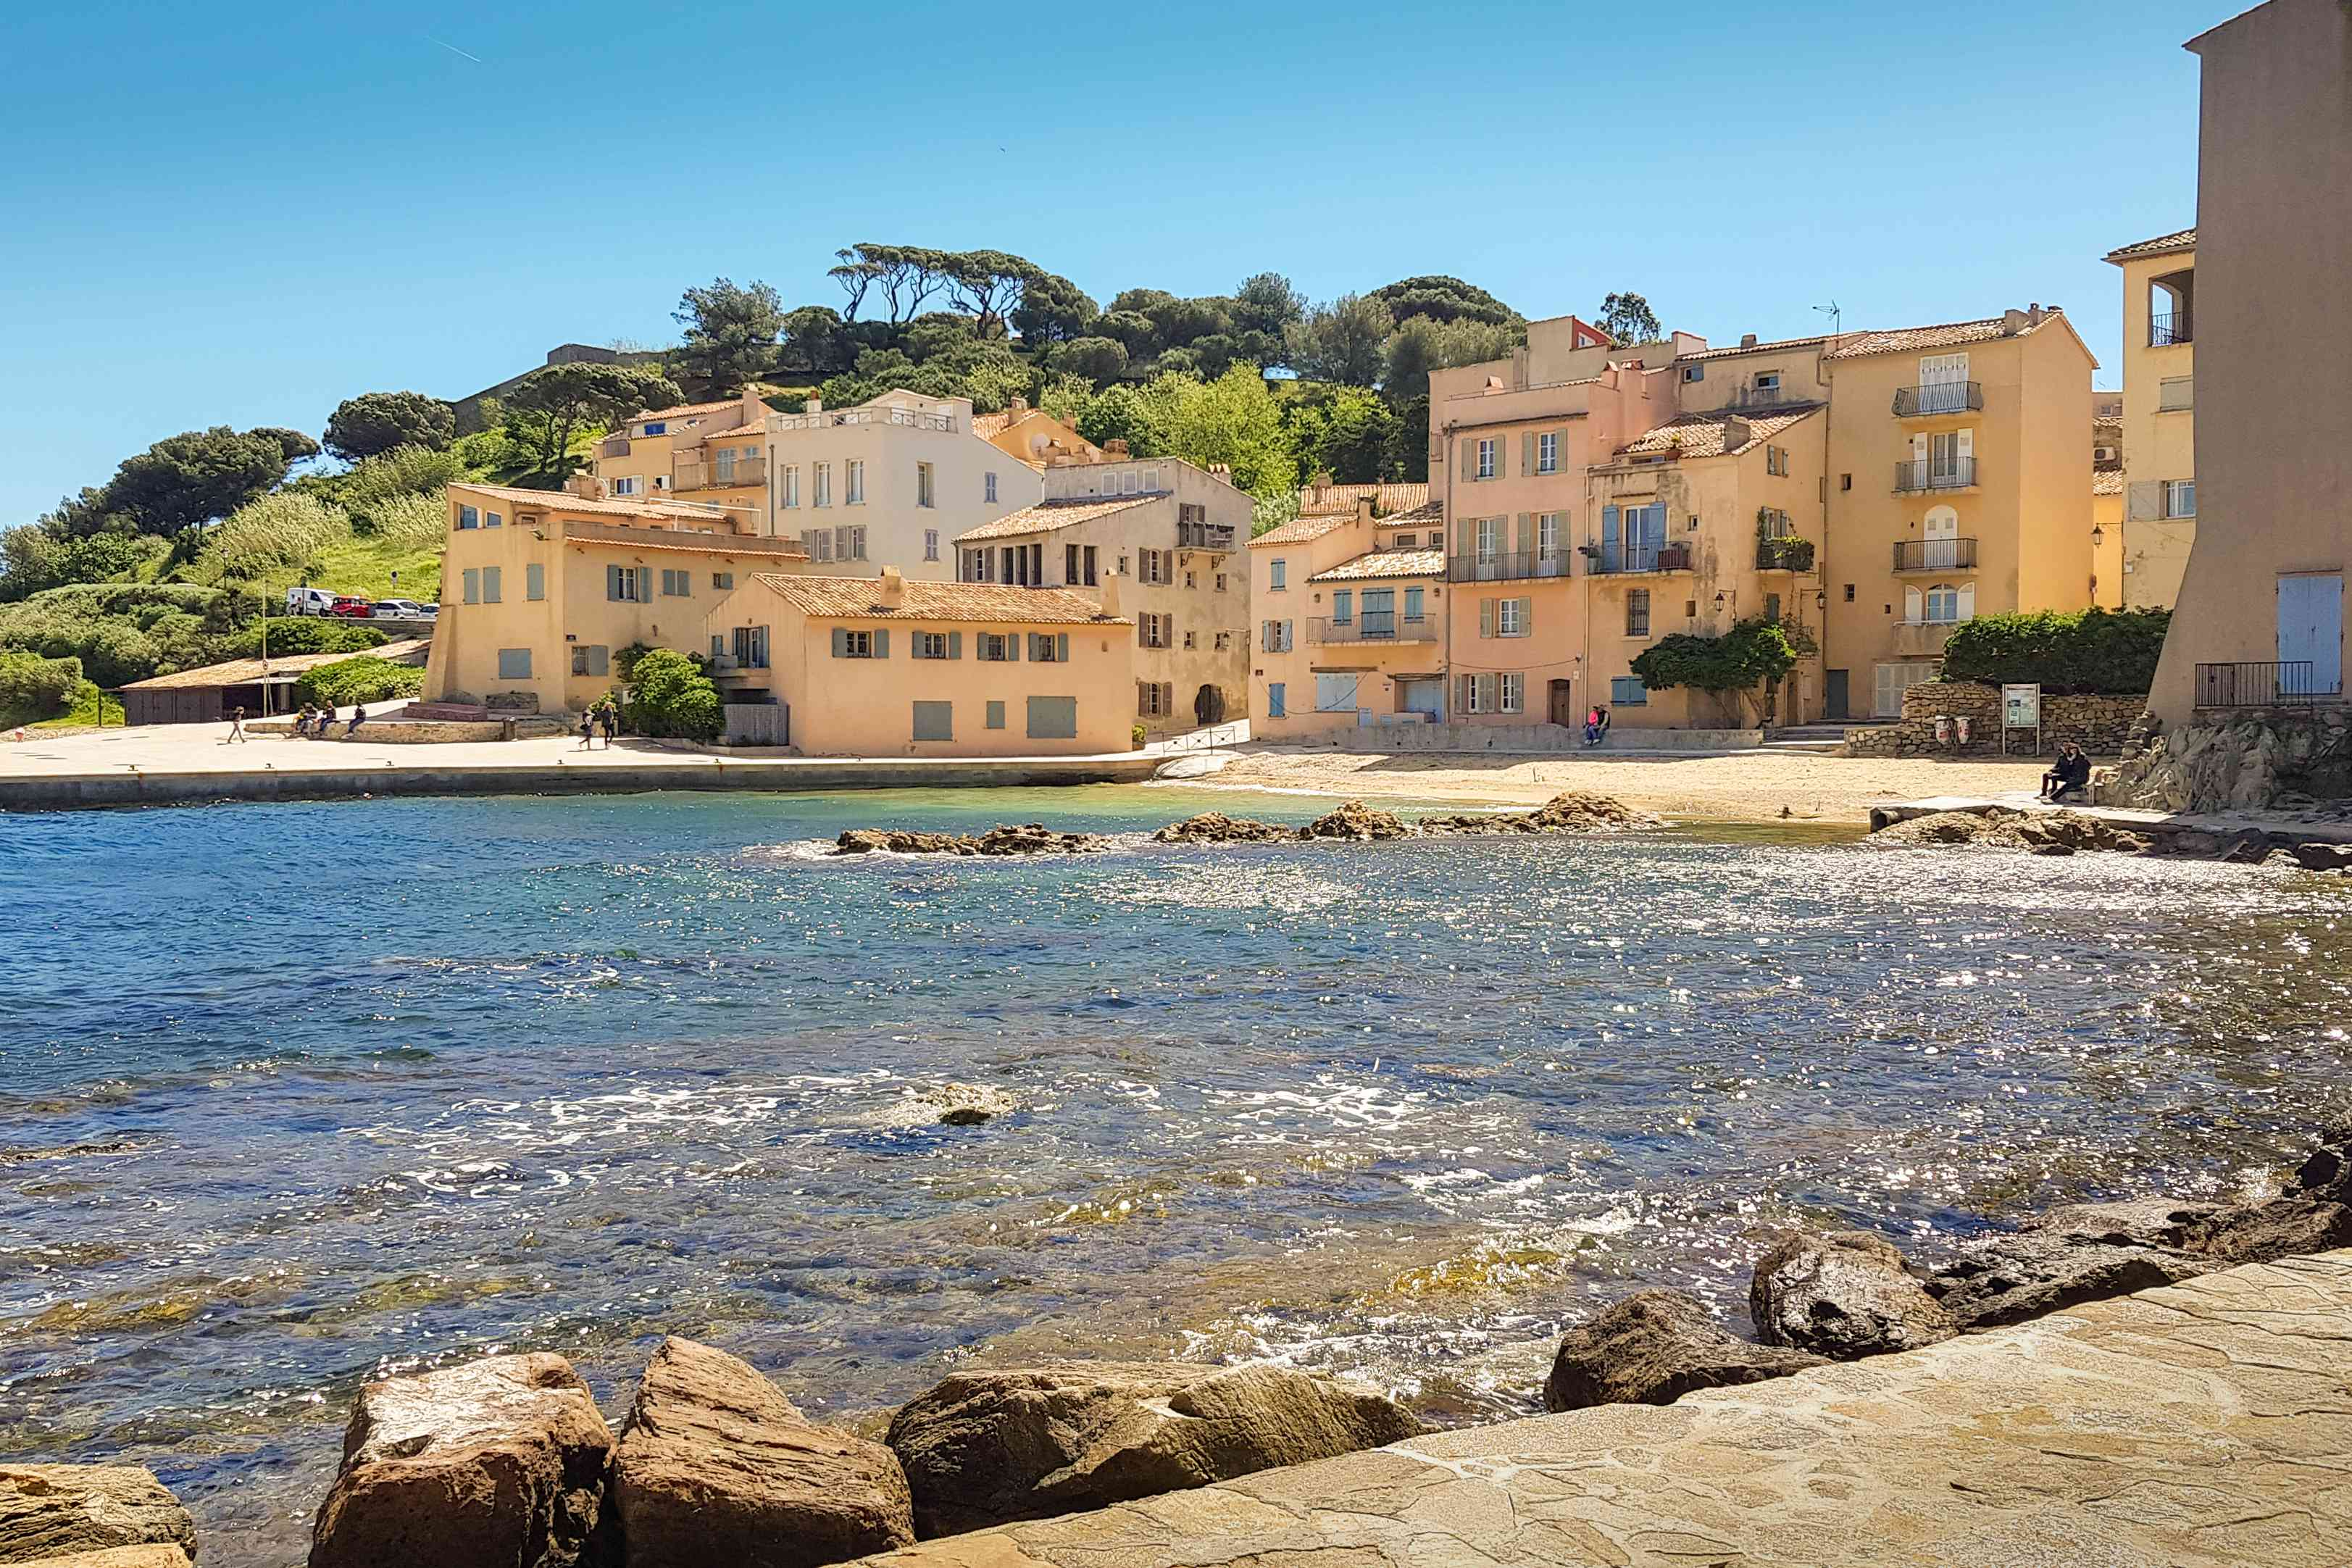 La Ponche, old fishing district in St-Tropez